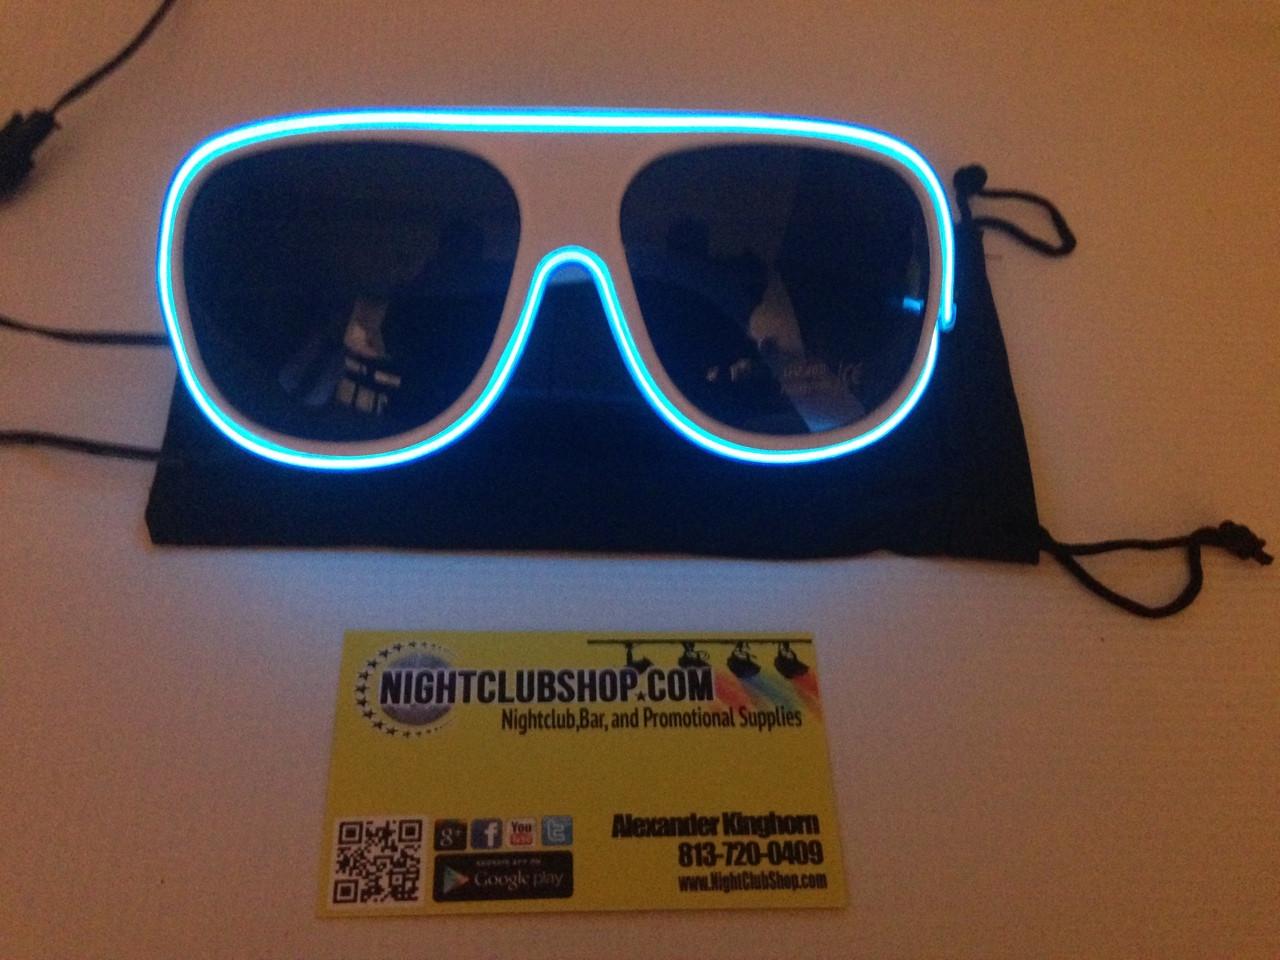 LED LITE UP GLASSES, LED LITECUBE, LiteUp Glasses, Light up, Sunglasses, sun Glasses, illuminated lenses, light up shades